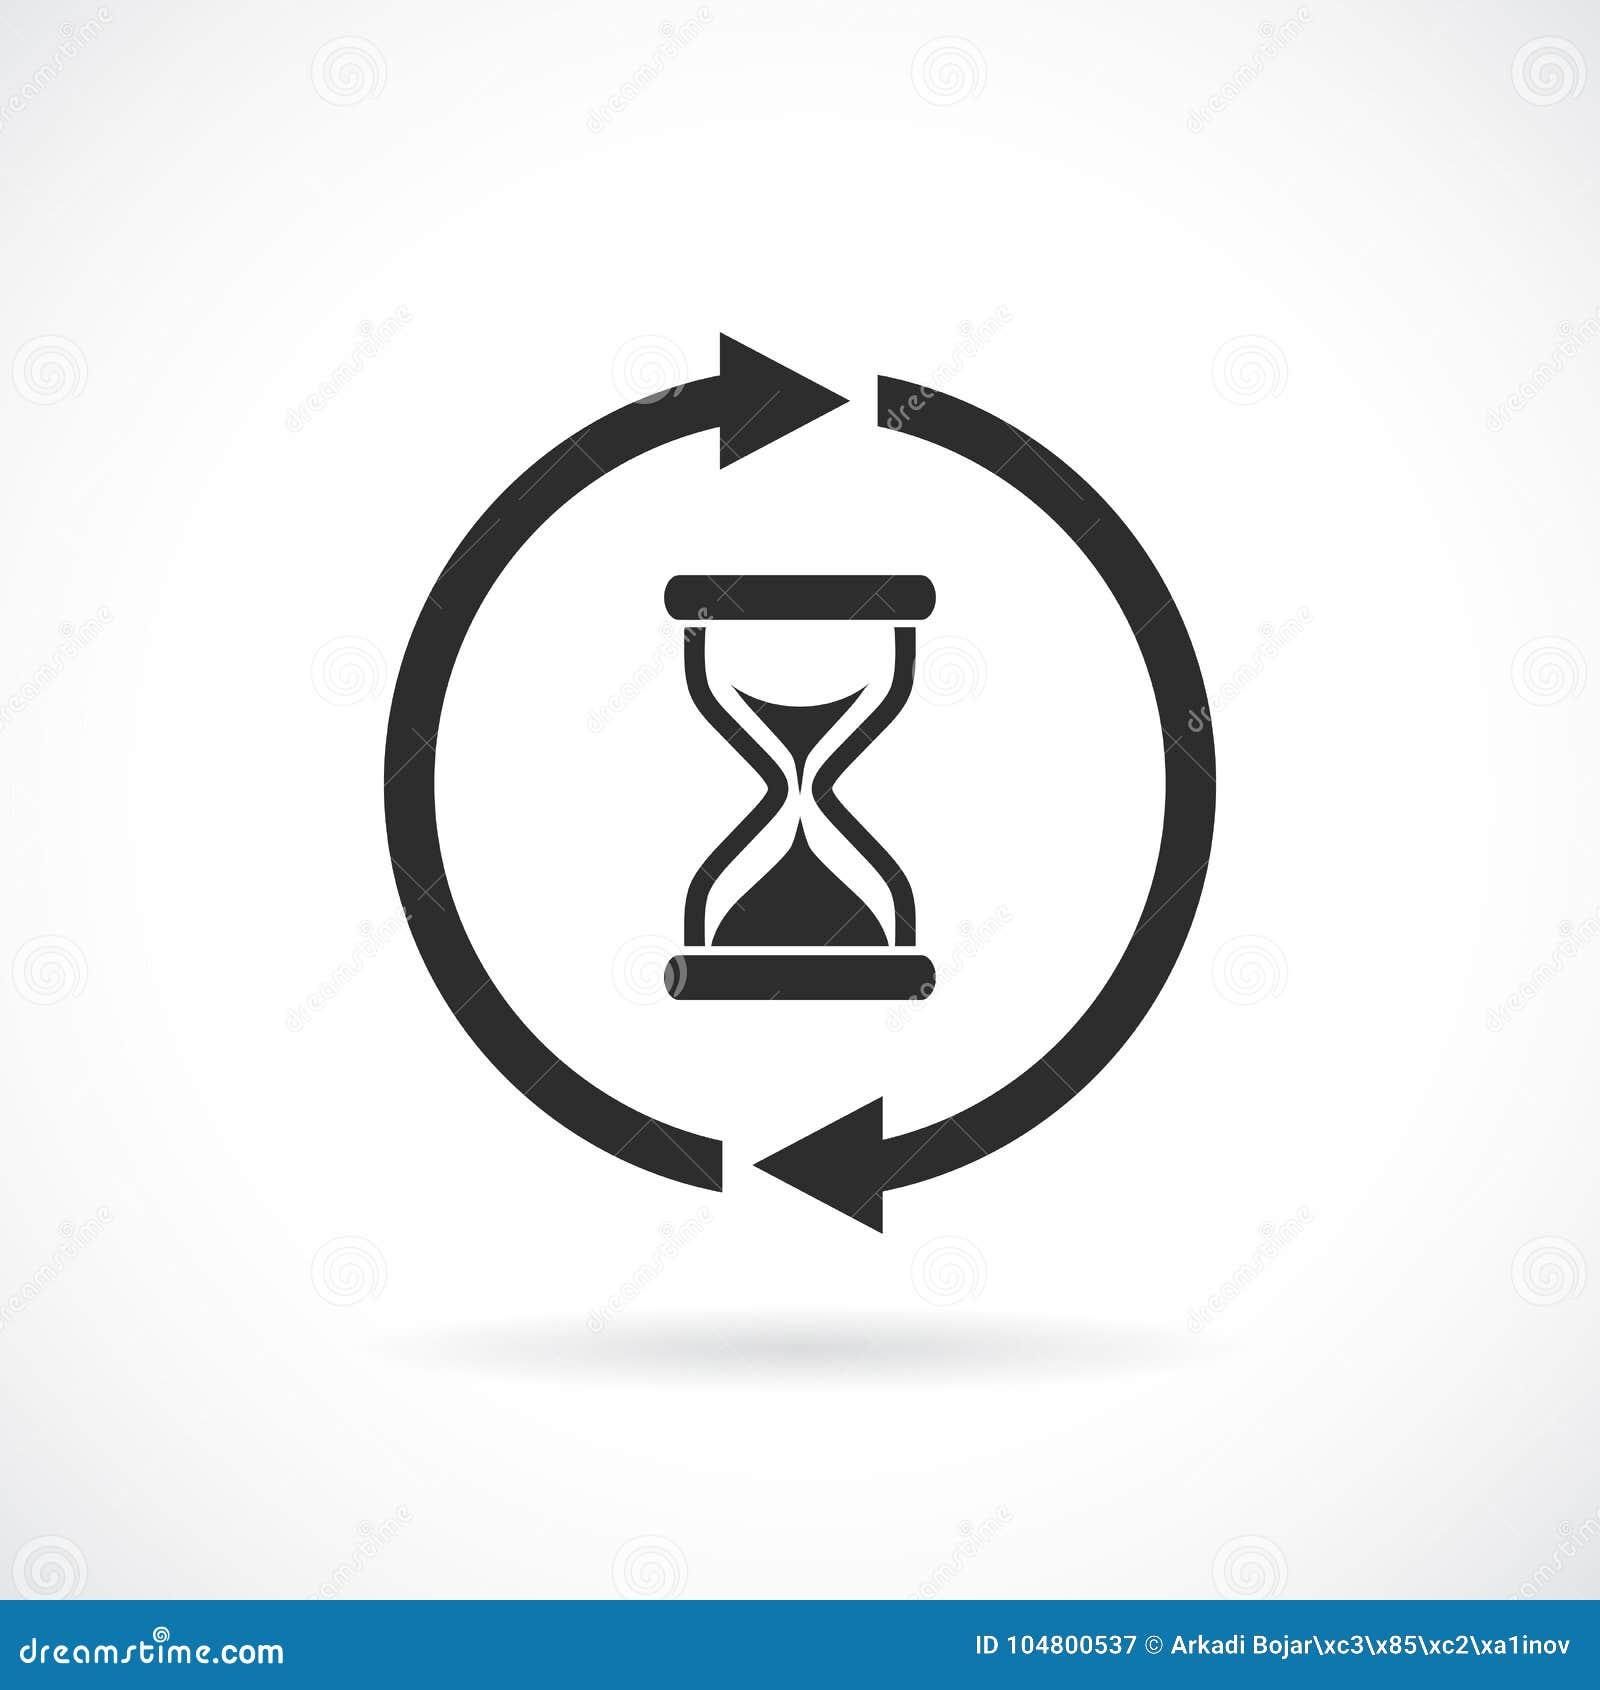 Pictograma do vetor da Web do tempo de espera